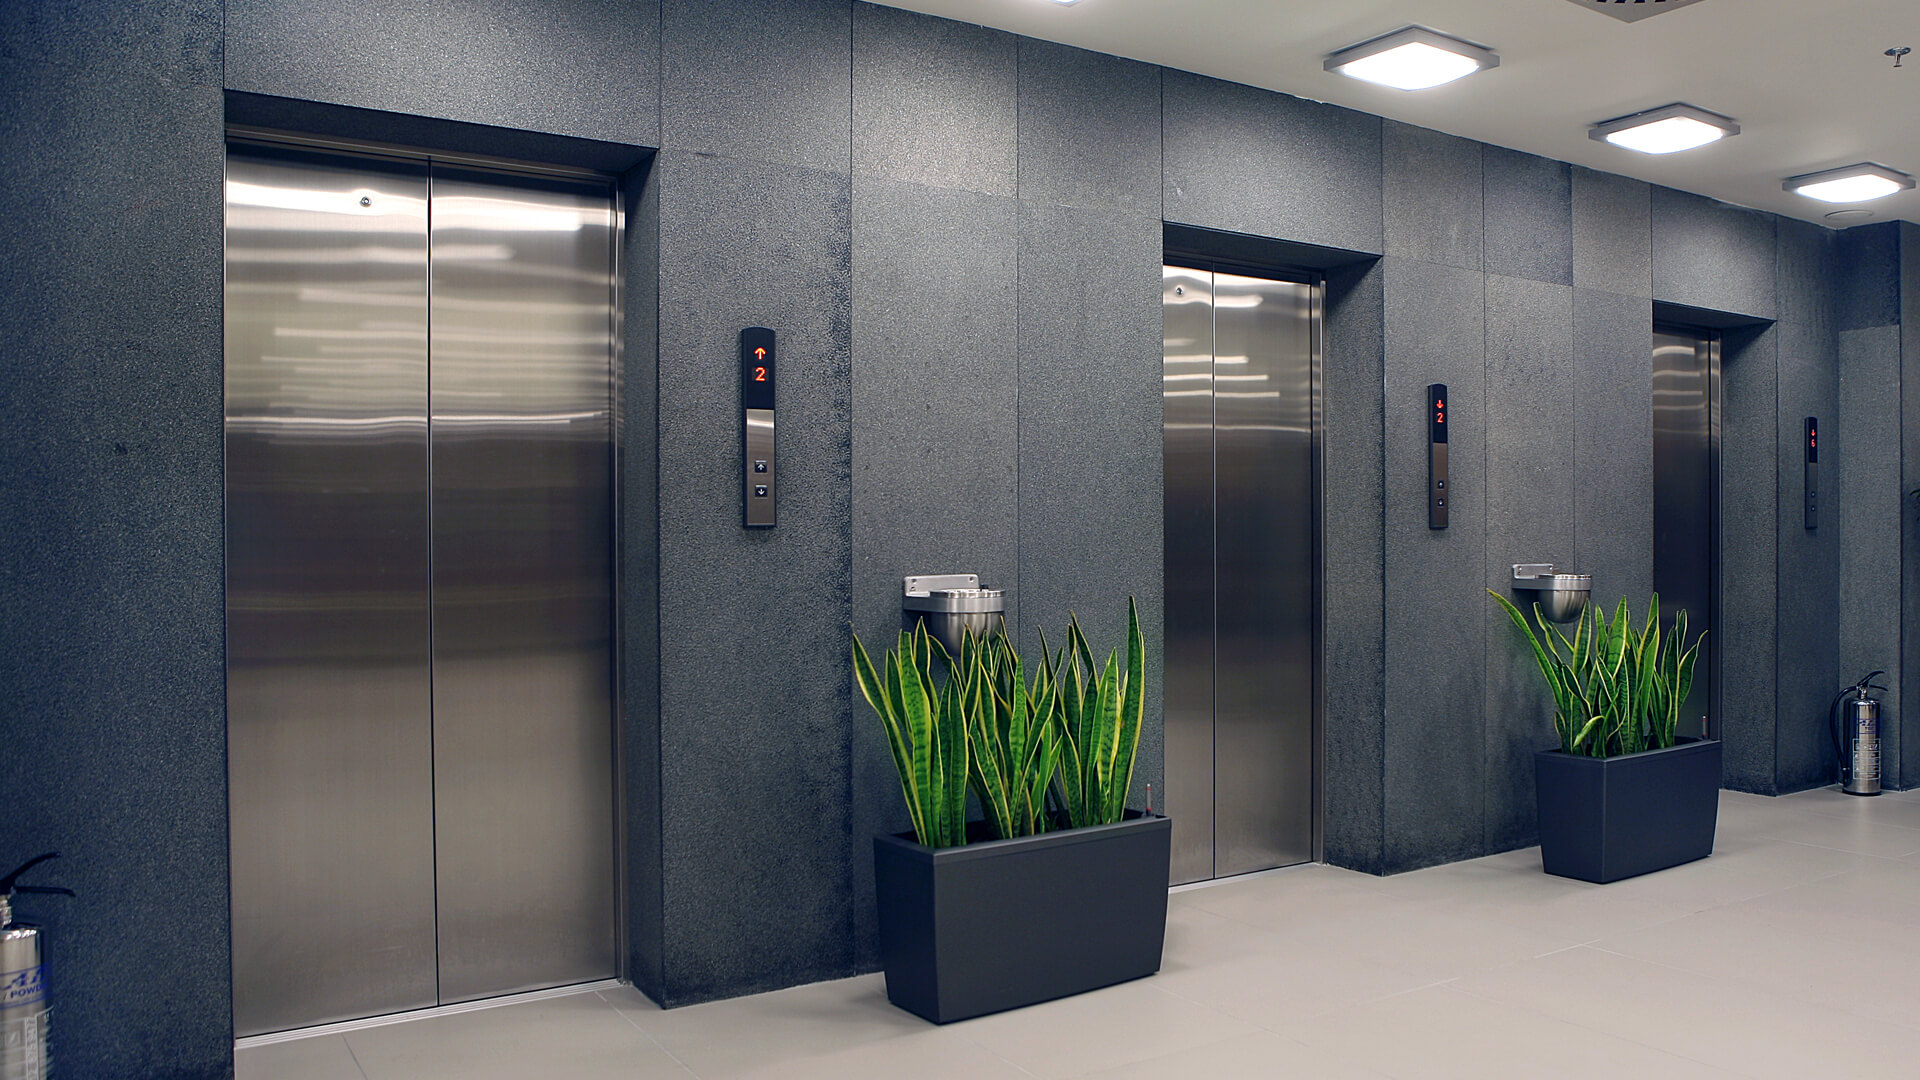 Elevator market in the world